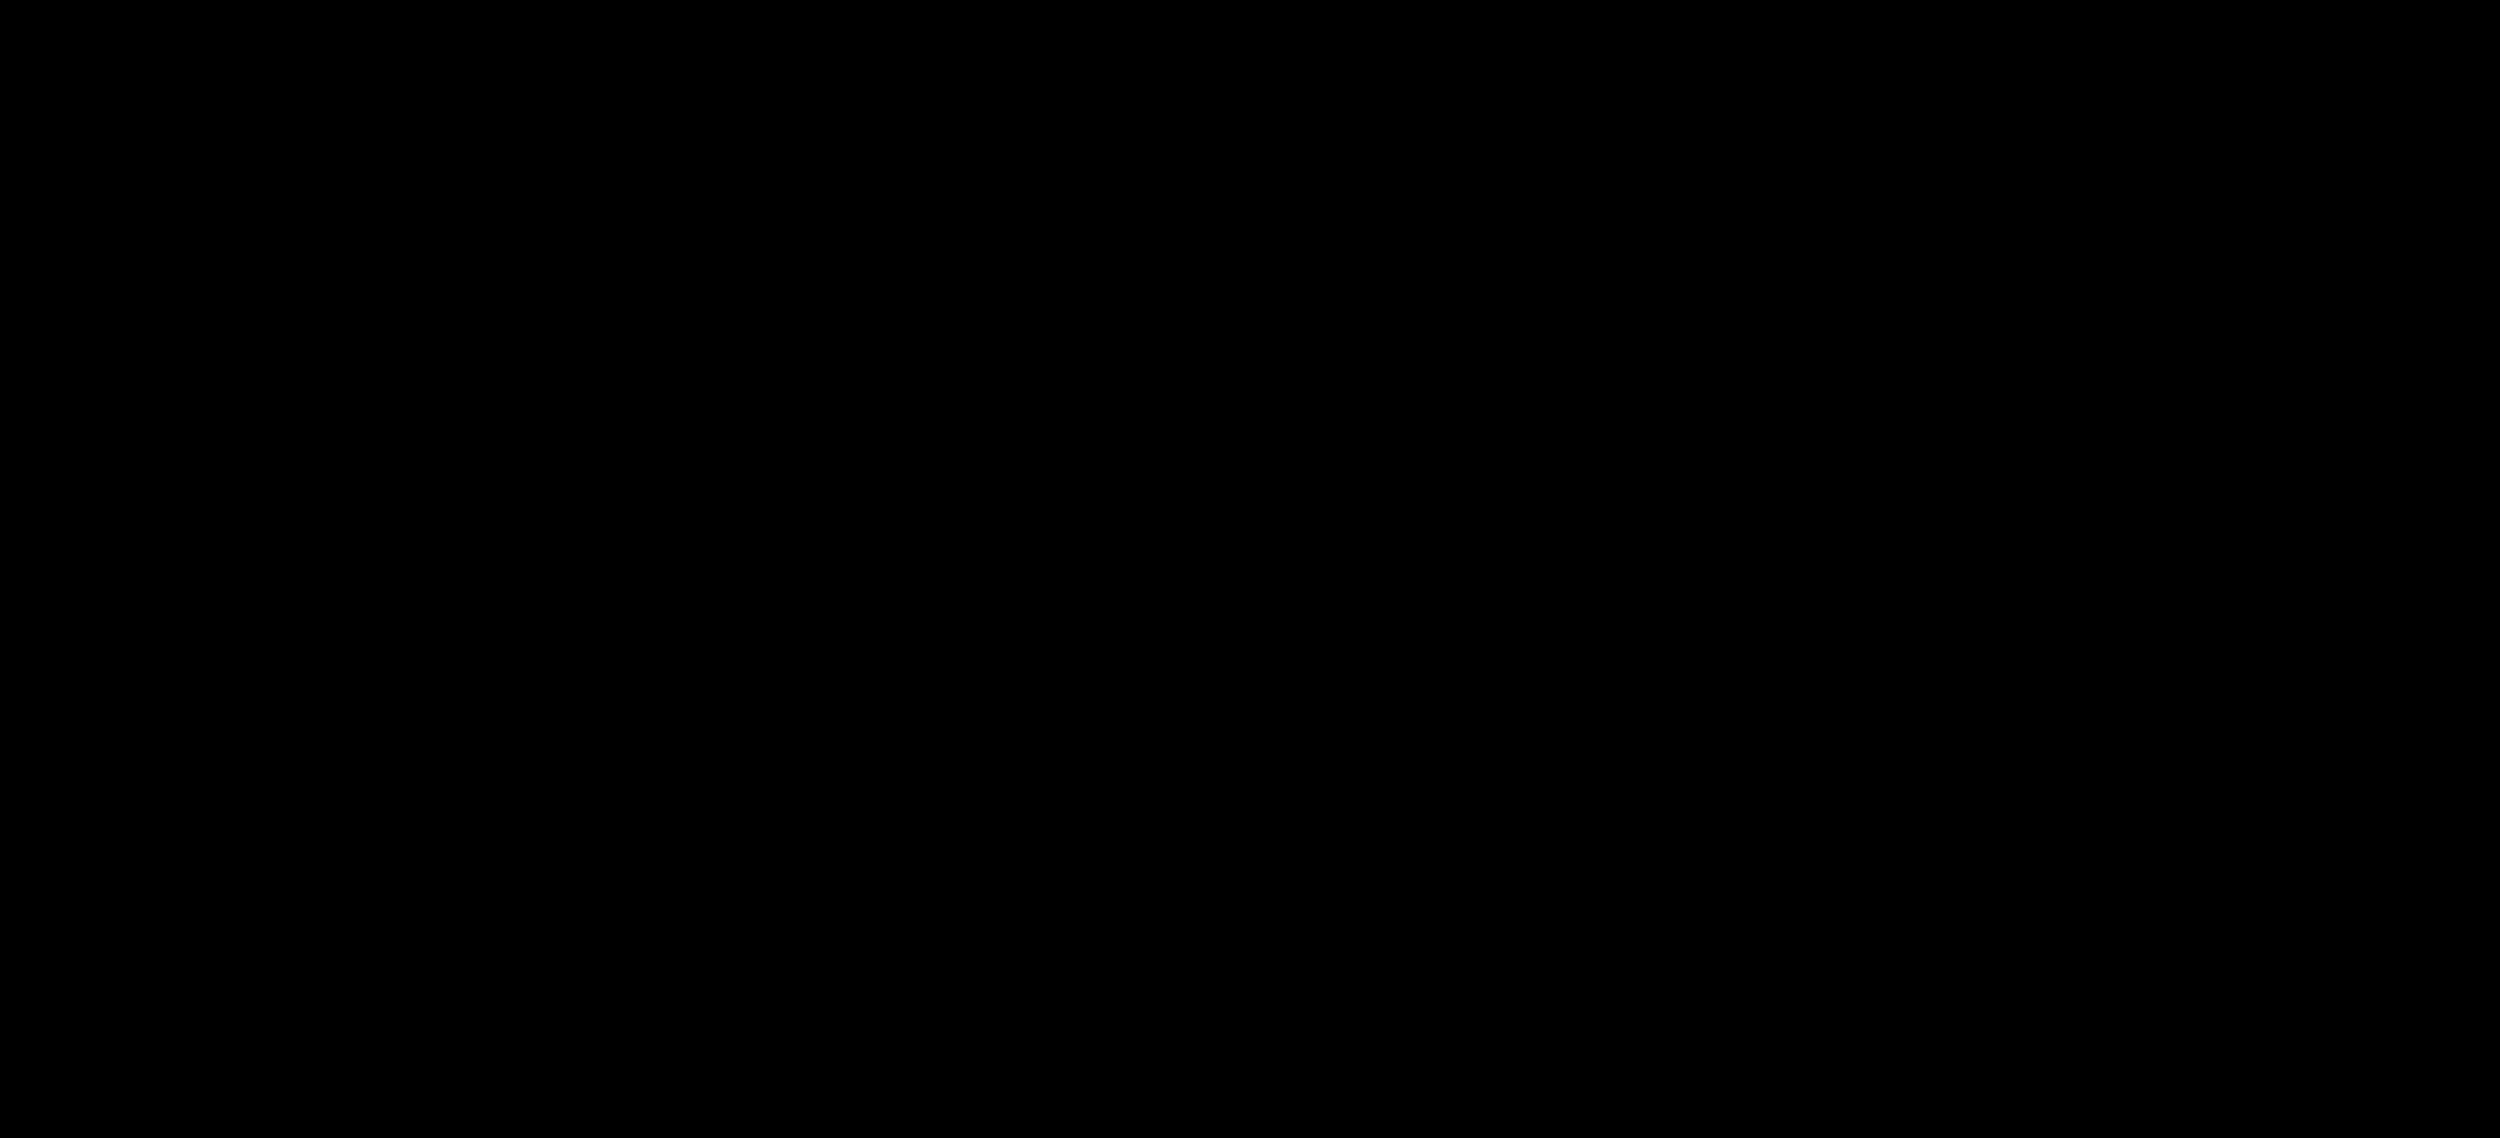 CCYP Vector Logo - Mono.png